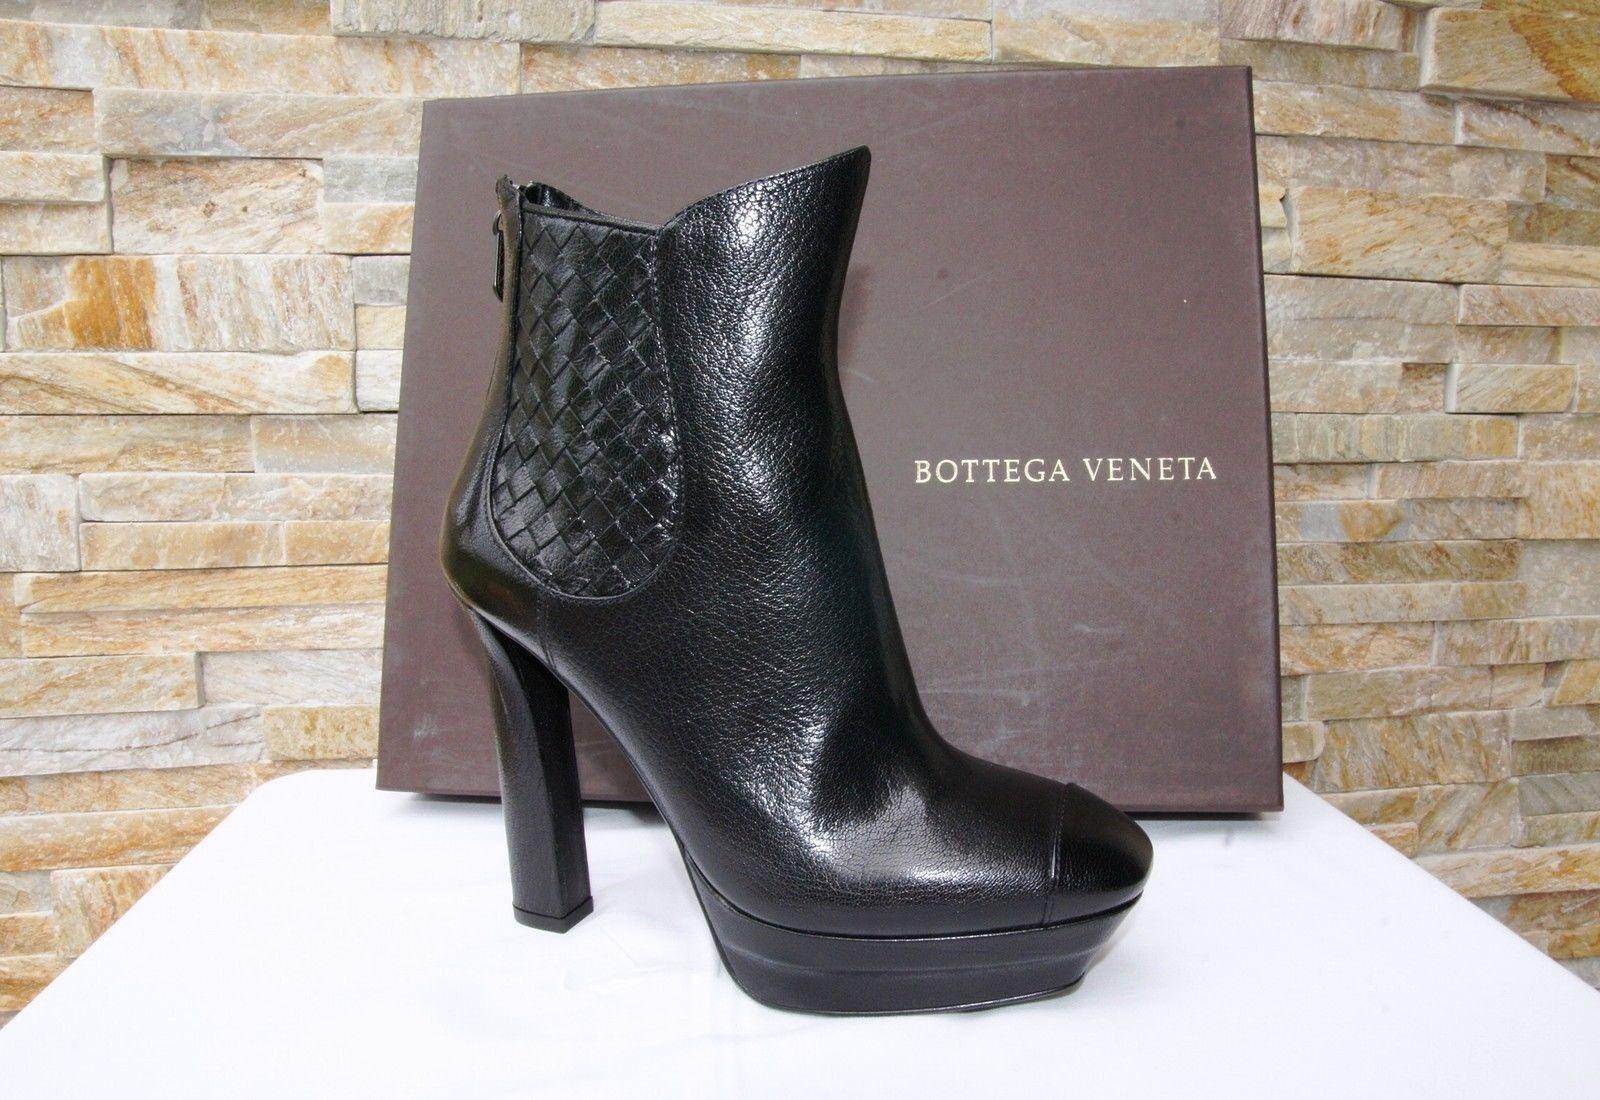 BOTTEGA VENETA 38 Stiefeletten Stiefeletten Stiefeletten Plateau Stiefelies Schuhe schwarz neu ehem   53740d